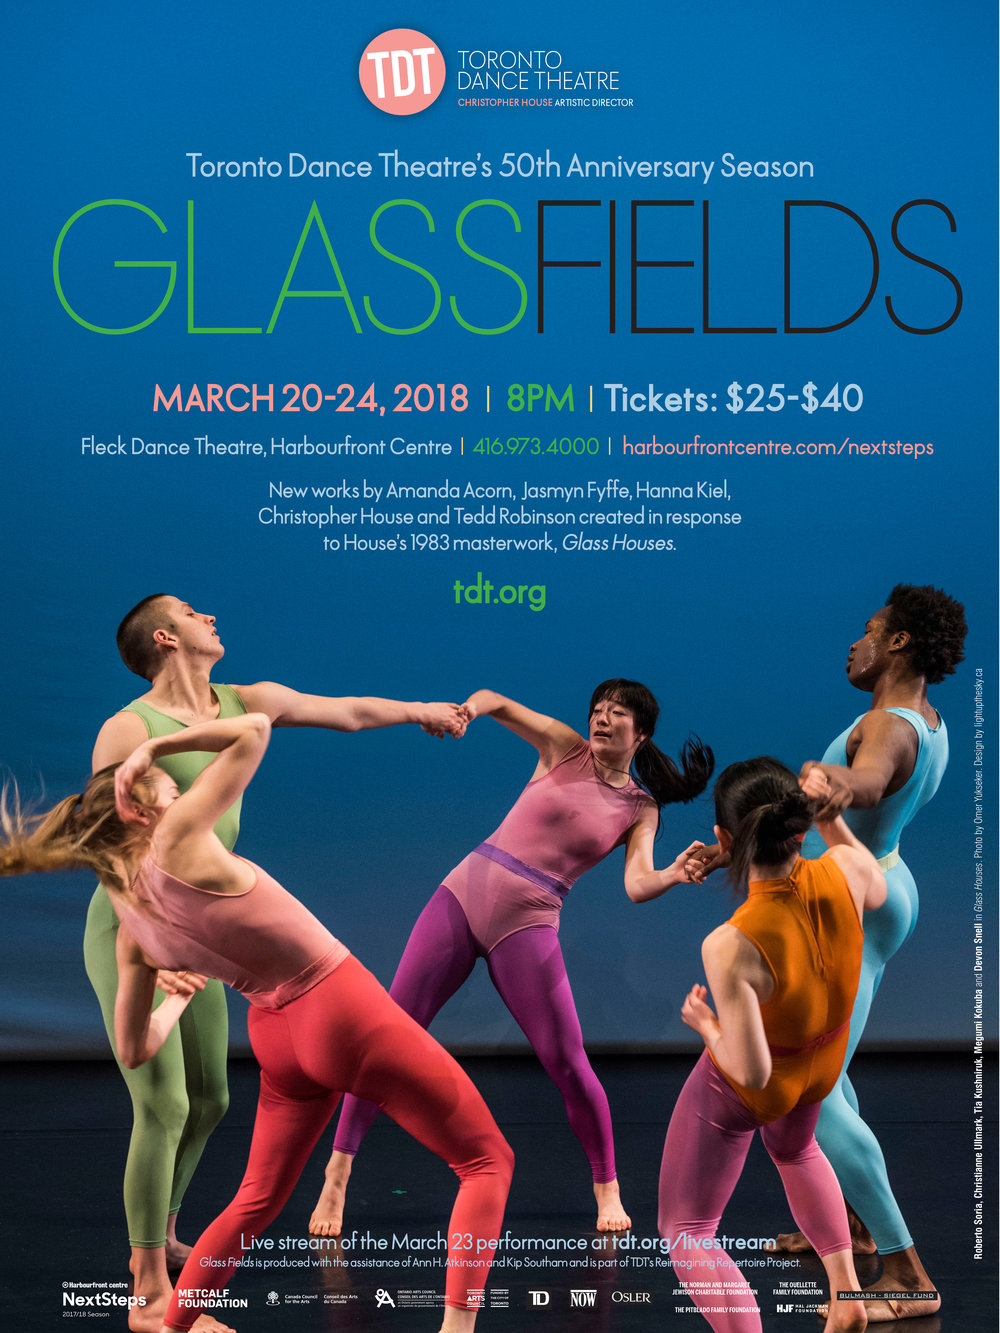 2203_TDT_GlassFields_18x24_Poster.jpg